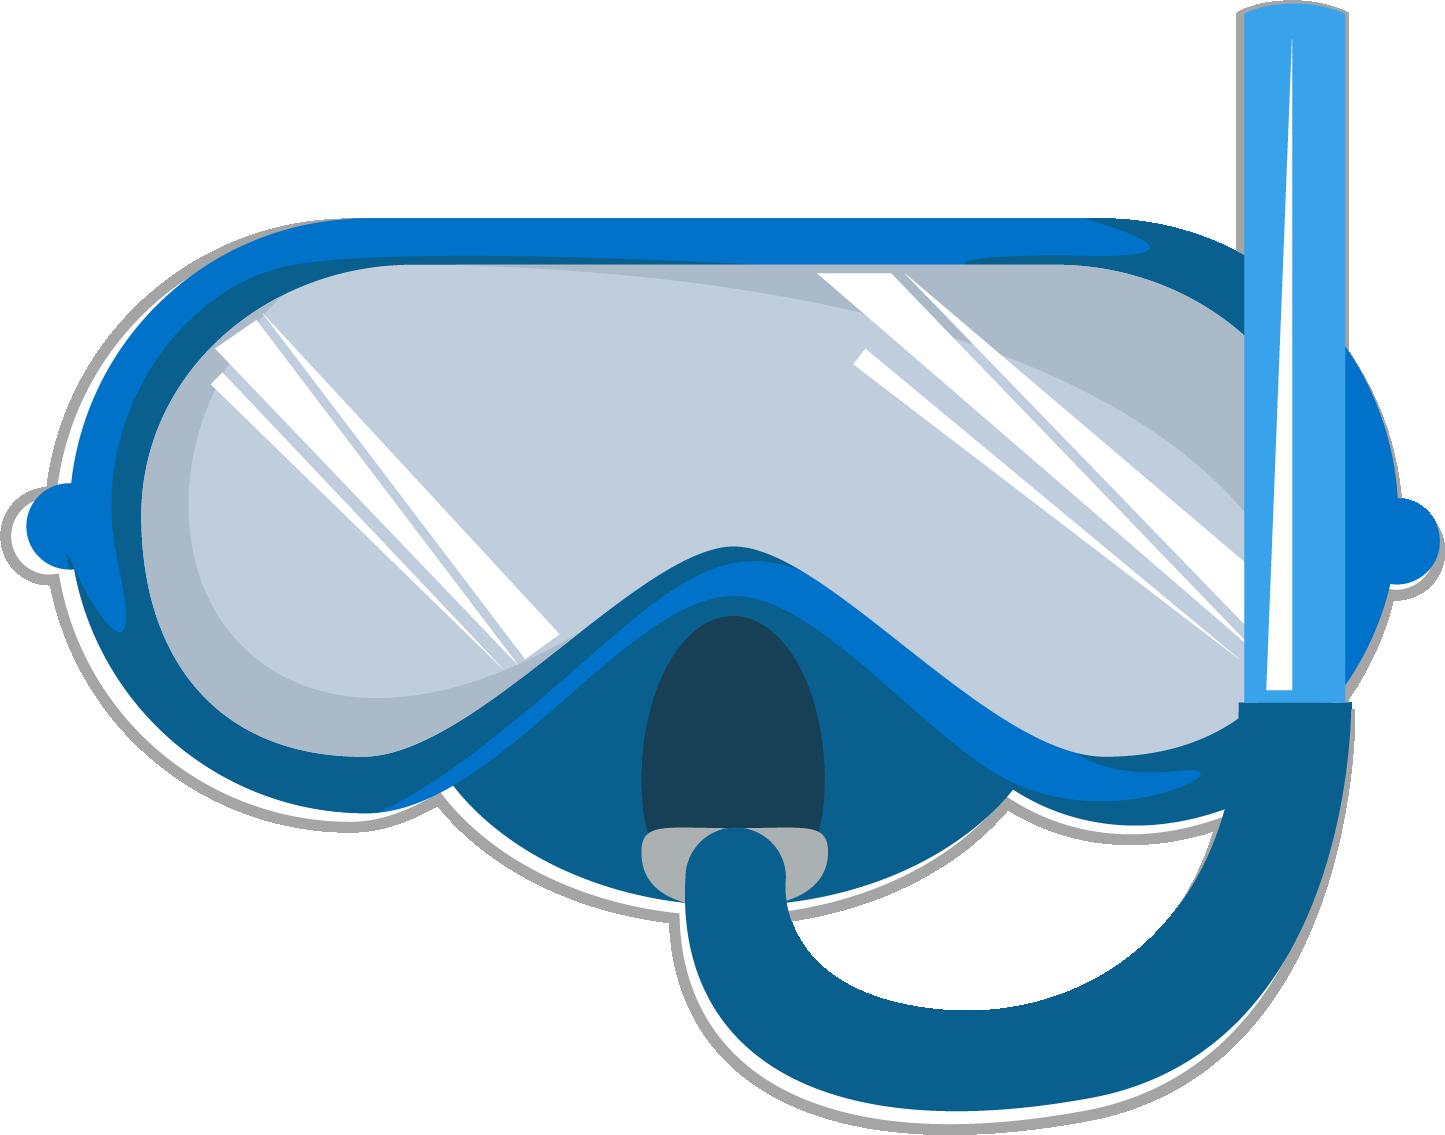 Eyeglasses clipart eye doctor equipment. Goggles swimming glasses clip